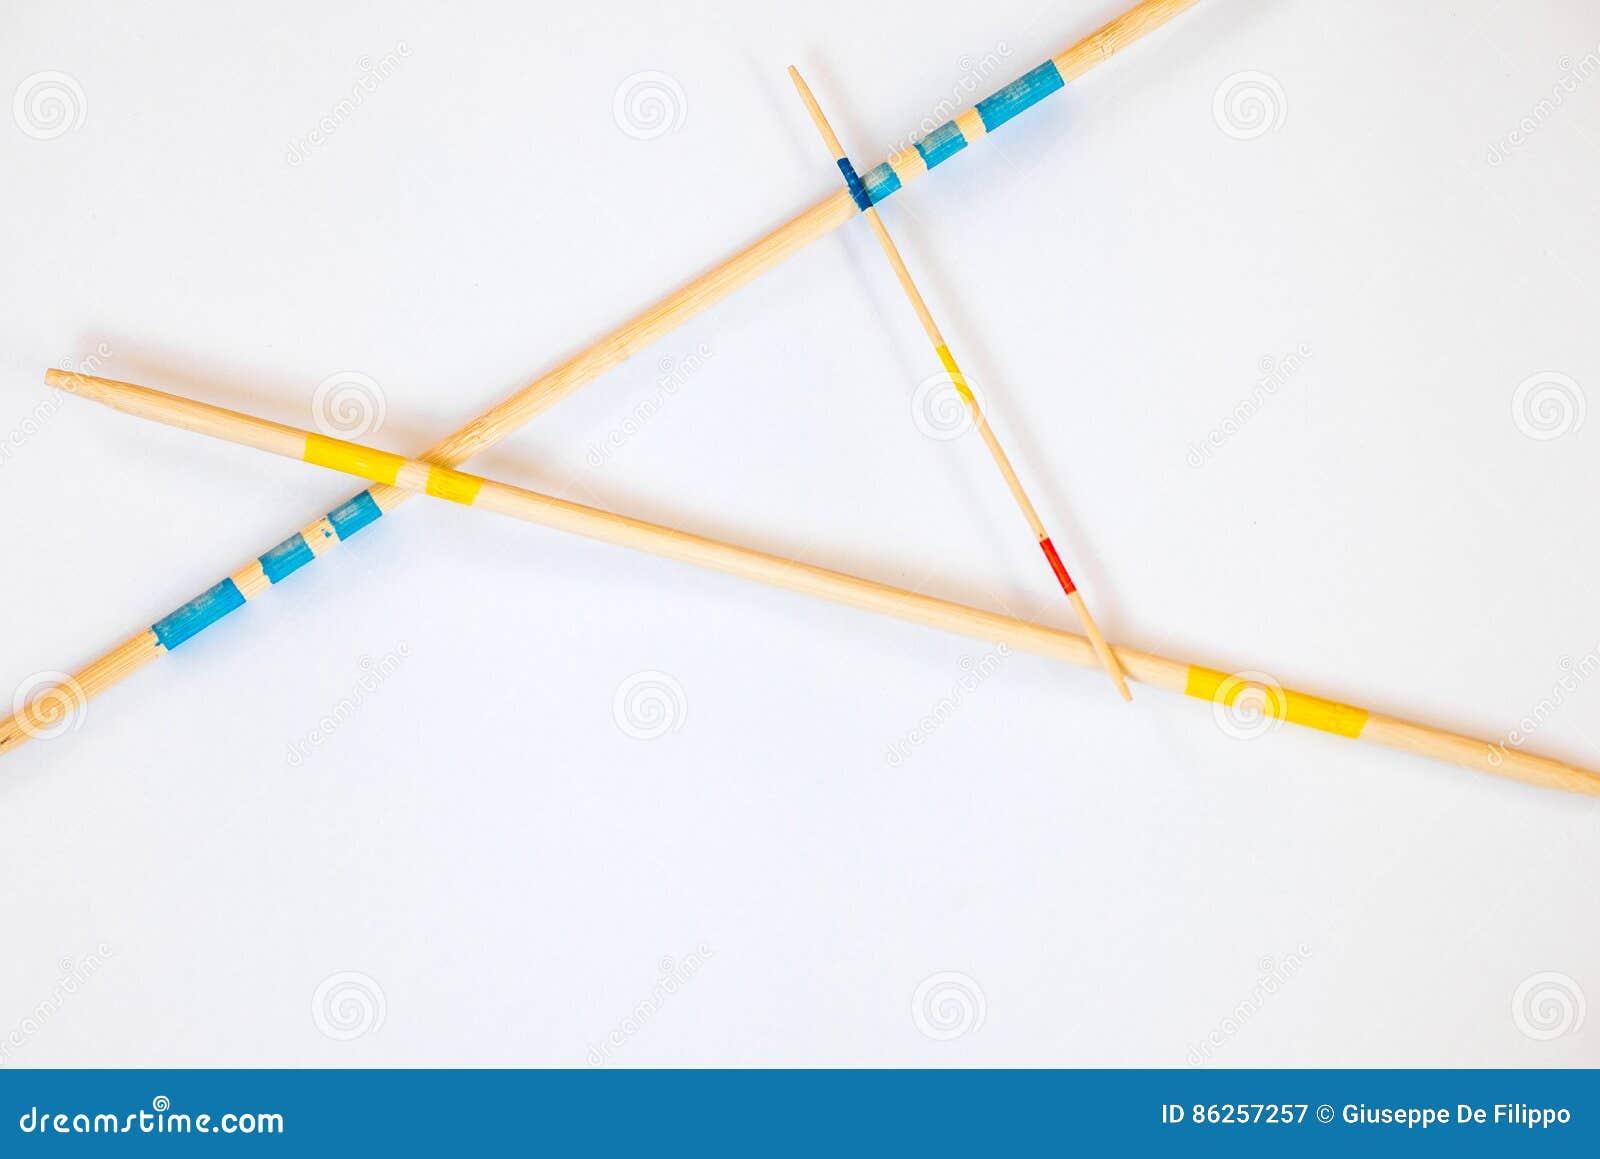 Ручки Mikado разбросали на белую предпосылку - 7